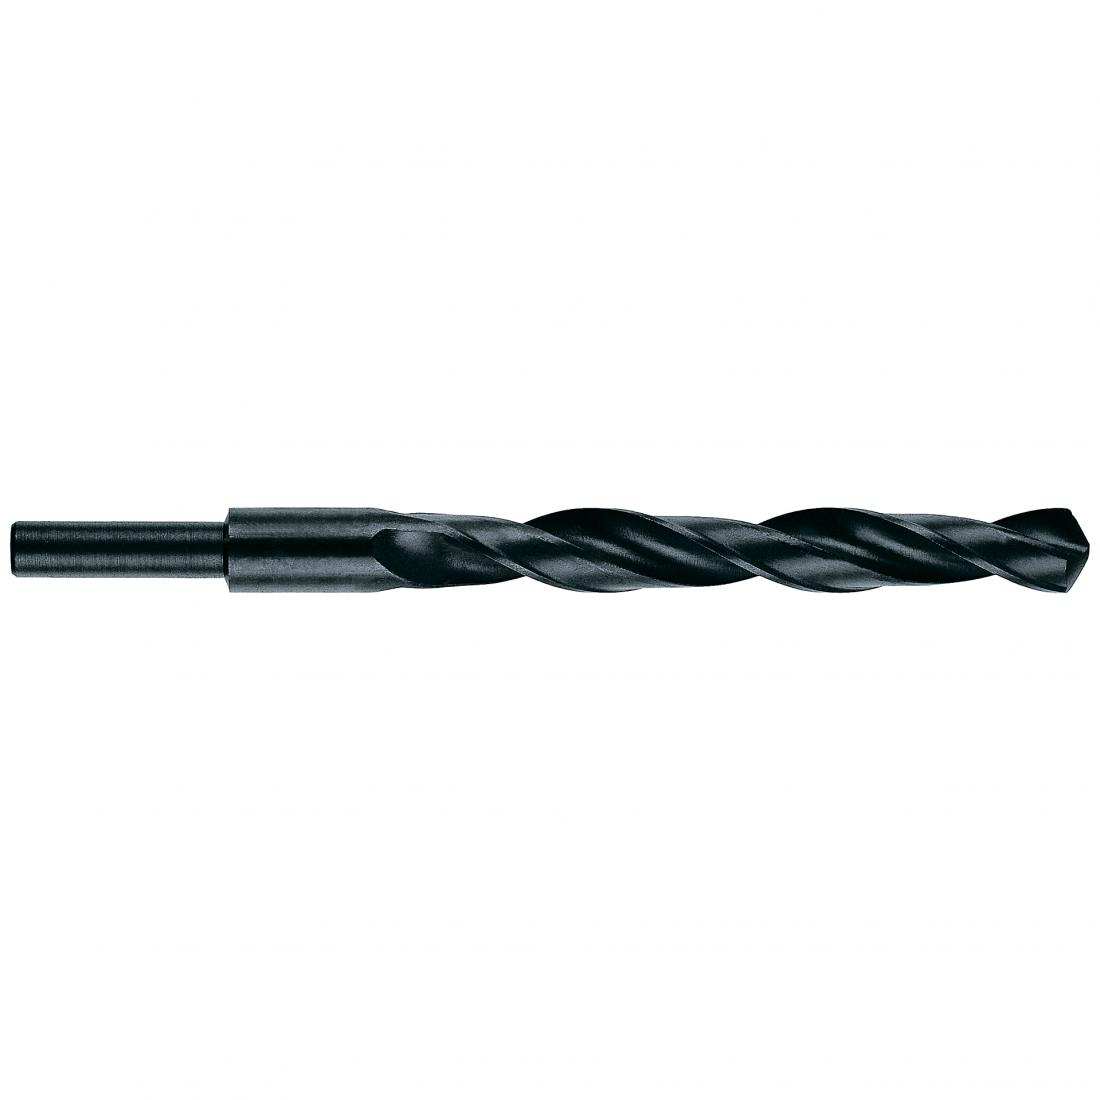 Сверло по металлу Heller HSS cо ступенчатым хвостовиком 17,5х130х181мм